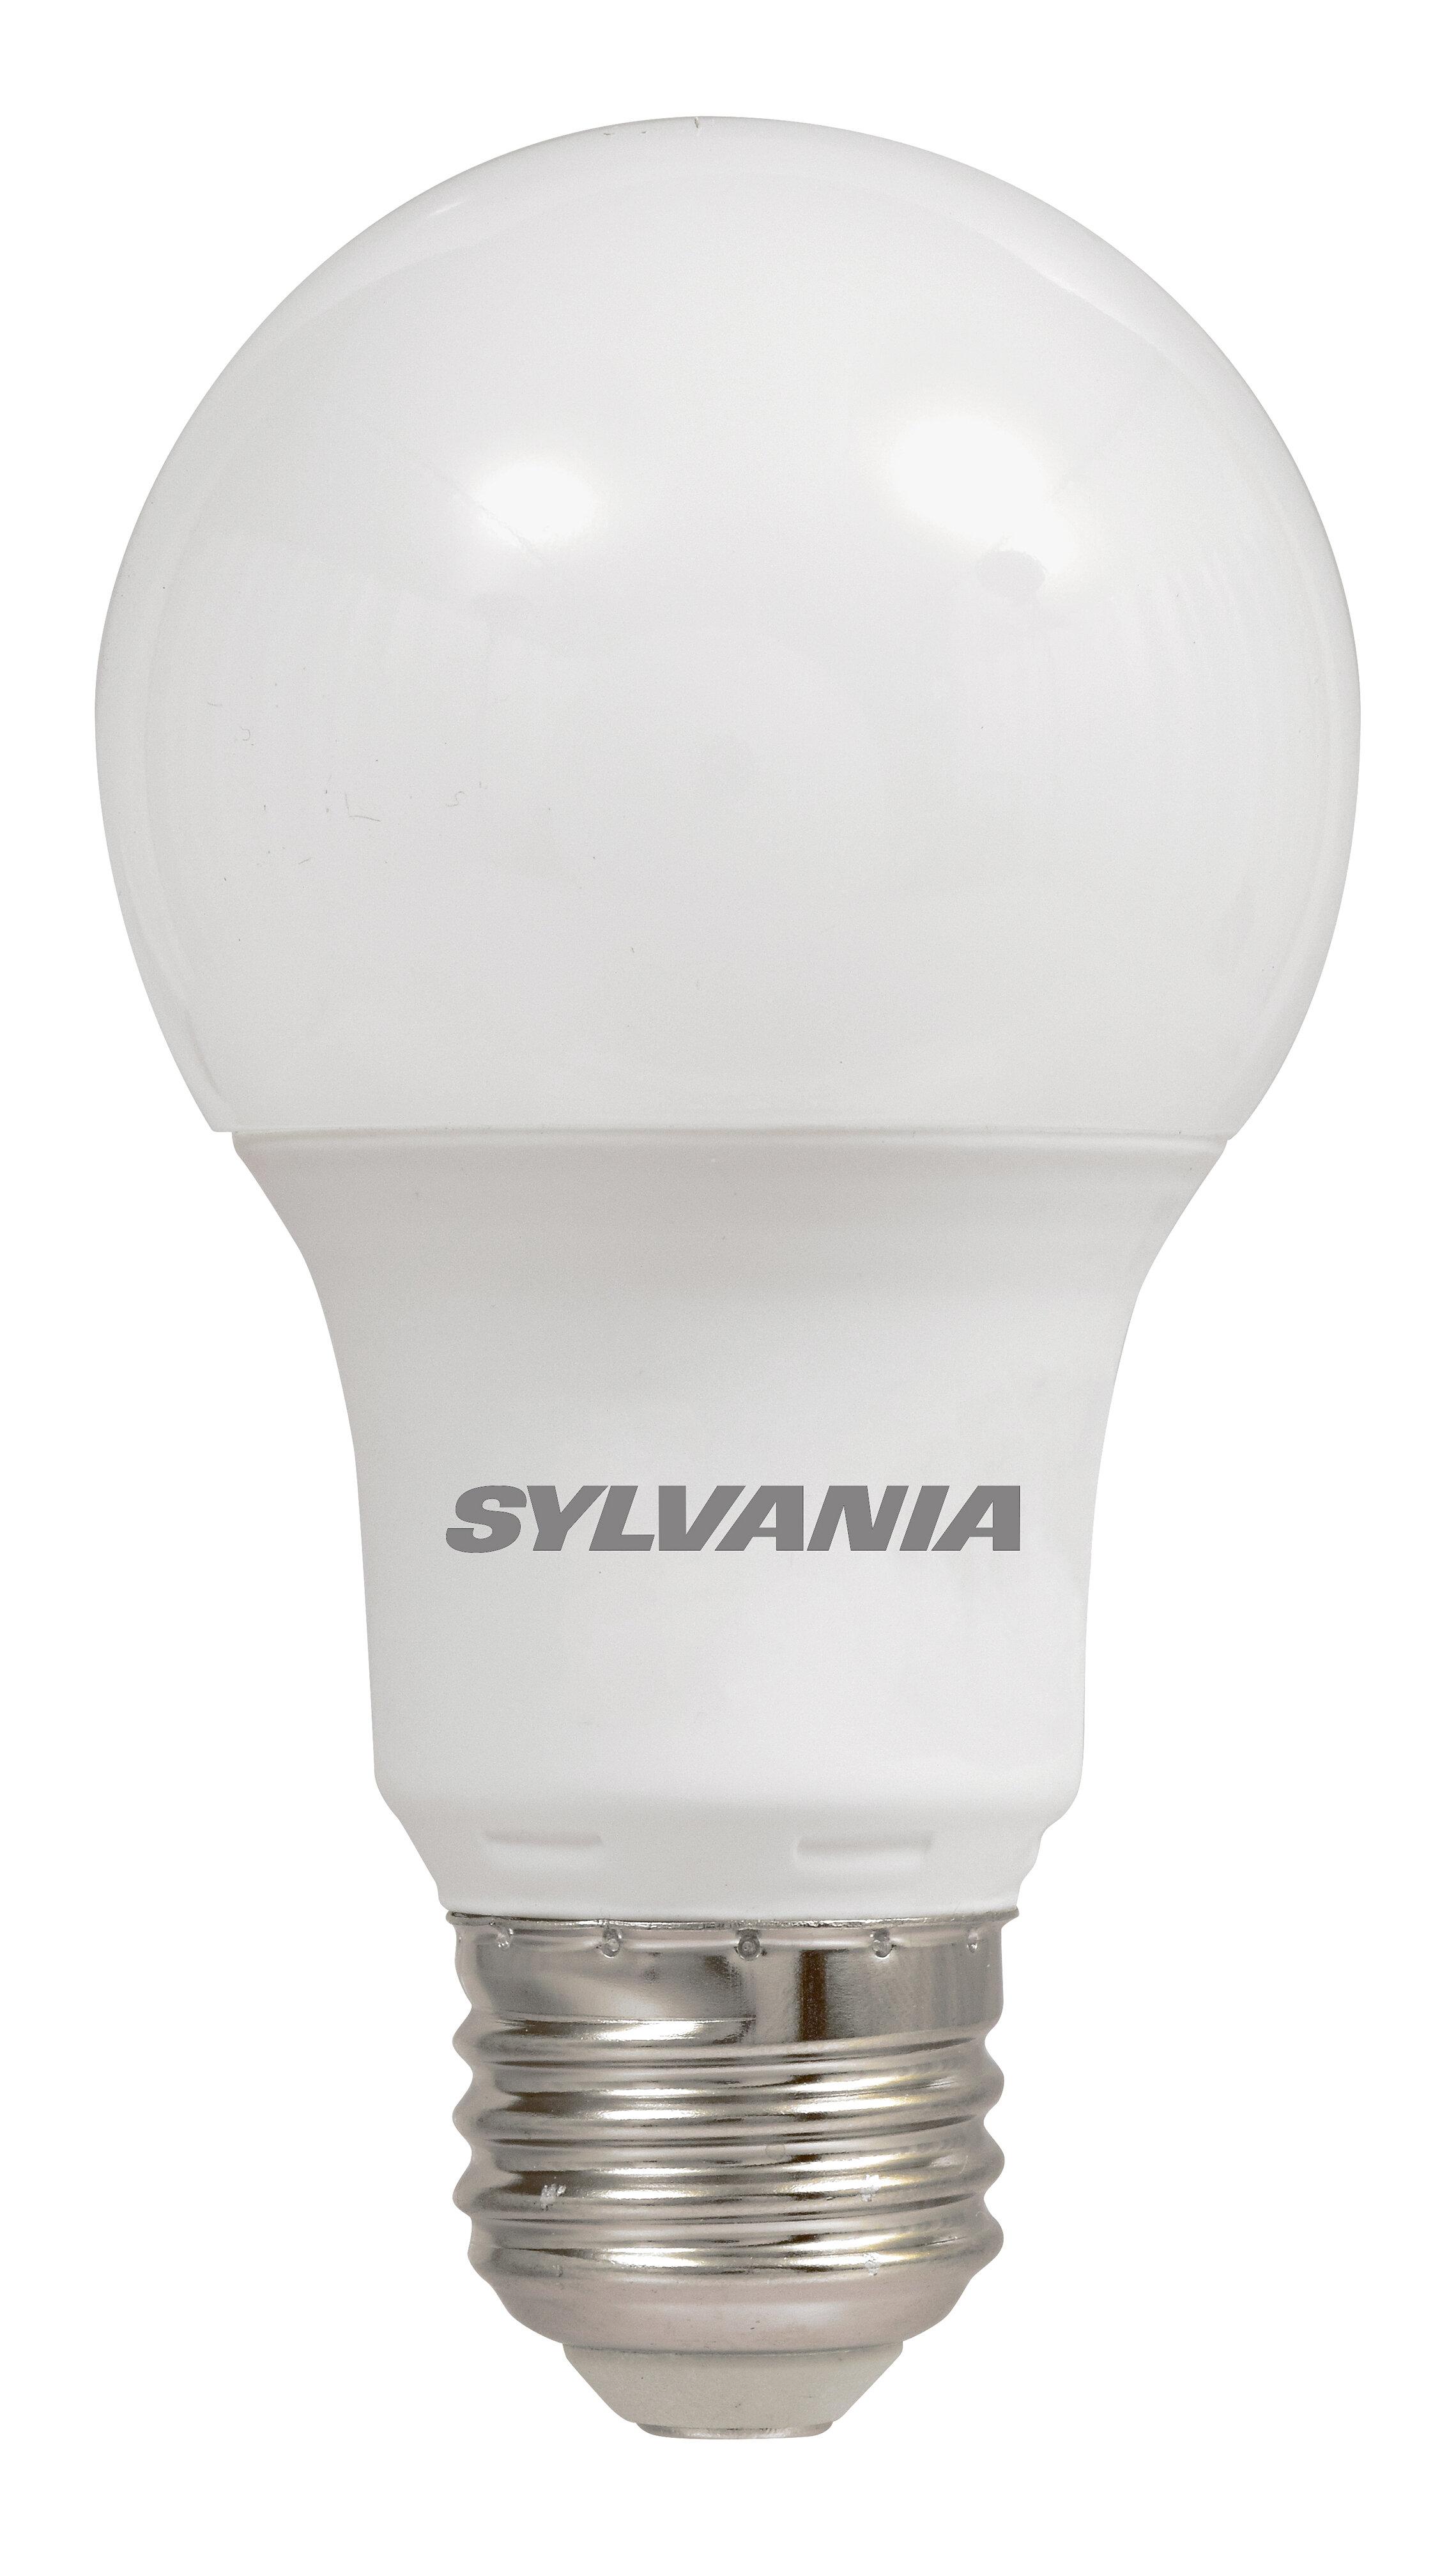 Sylvania 6 Watt 40 Watt Equivalent A19 Led Non Dimmable Light